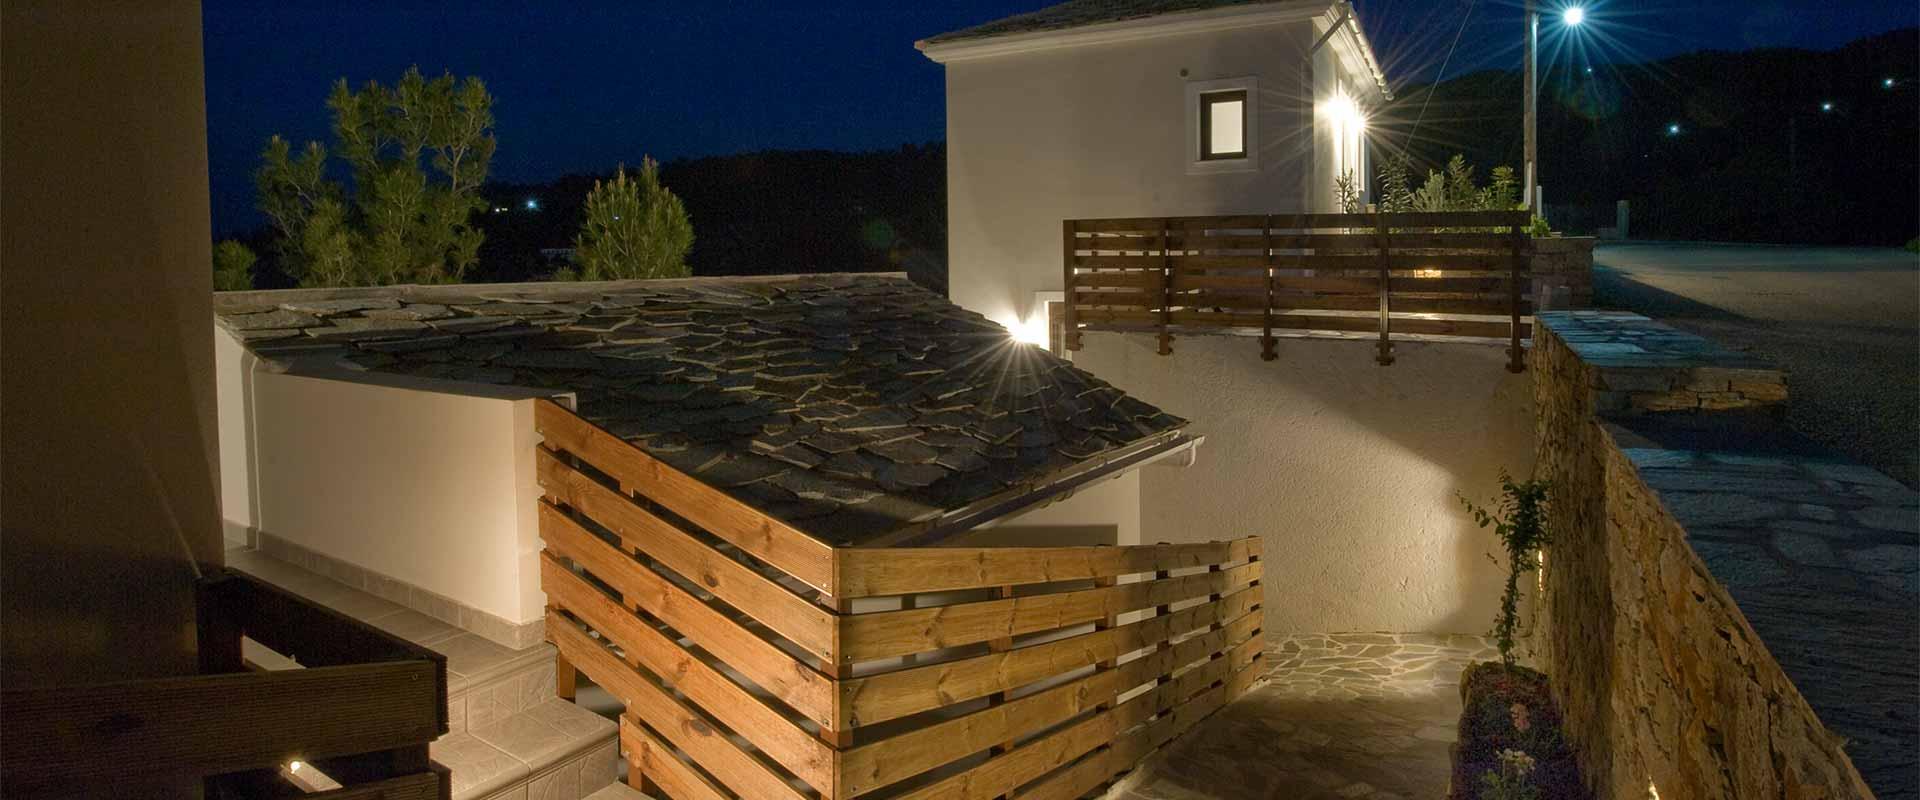 ikaria olivia villas night view image